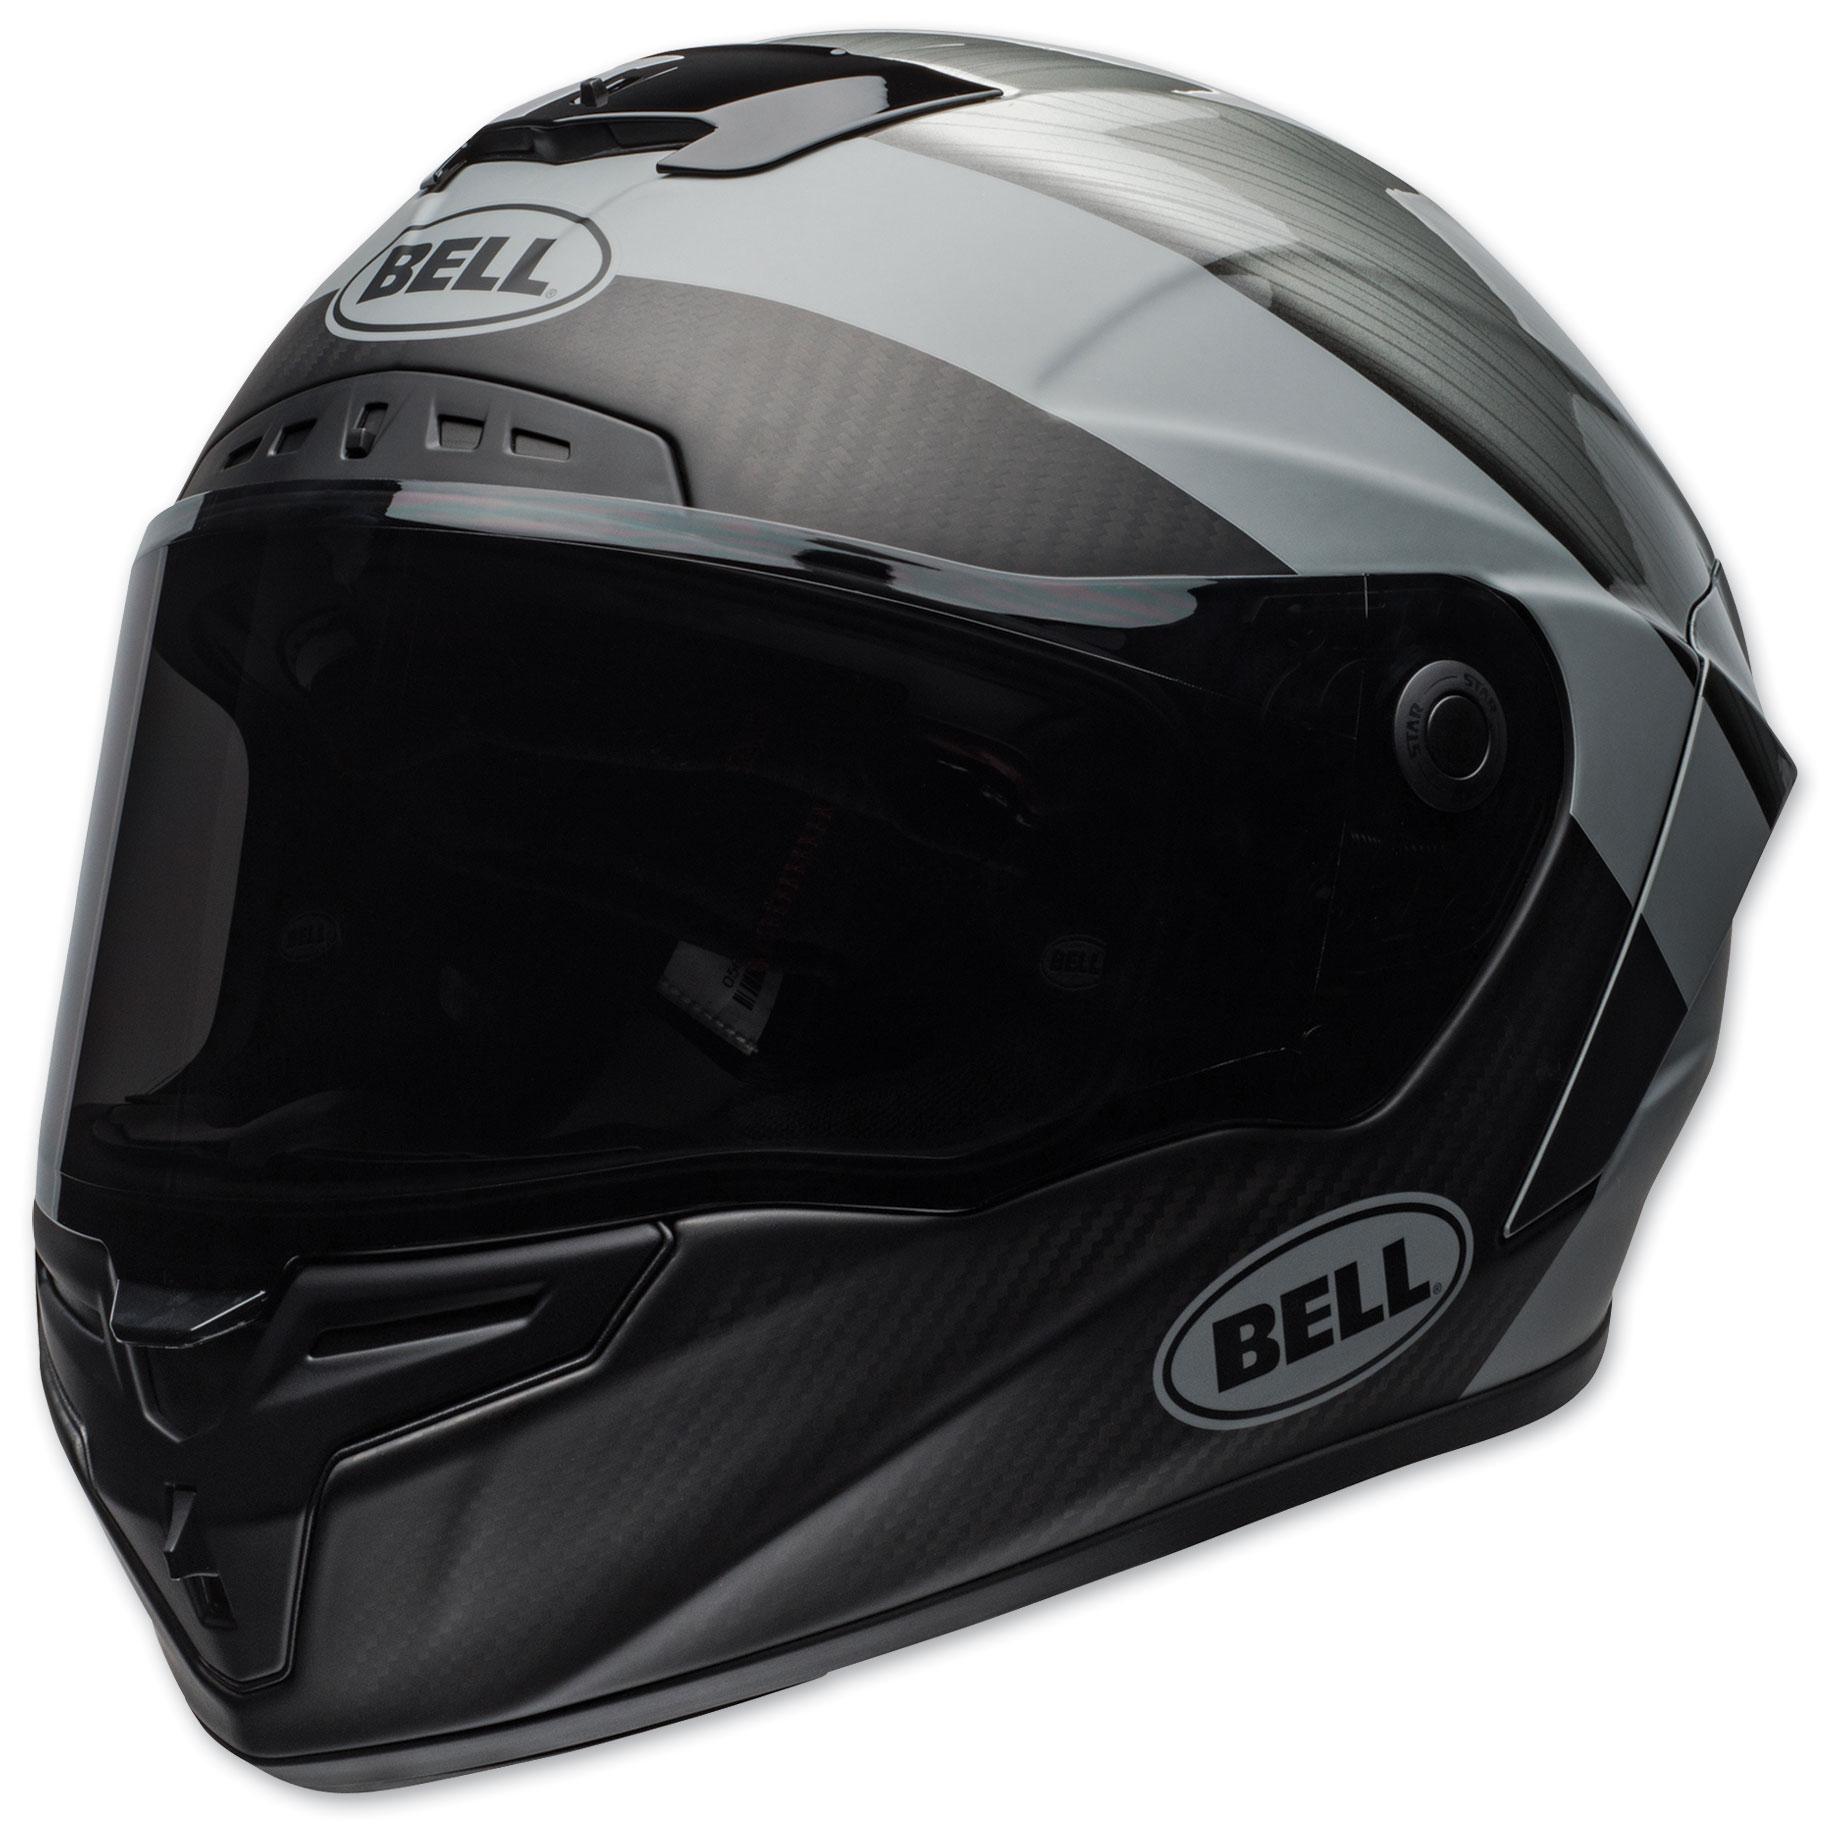 Bell Race Star Flex DLX Surge Metal/Gray Full Face Helmet